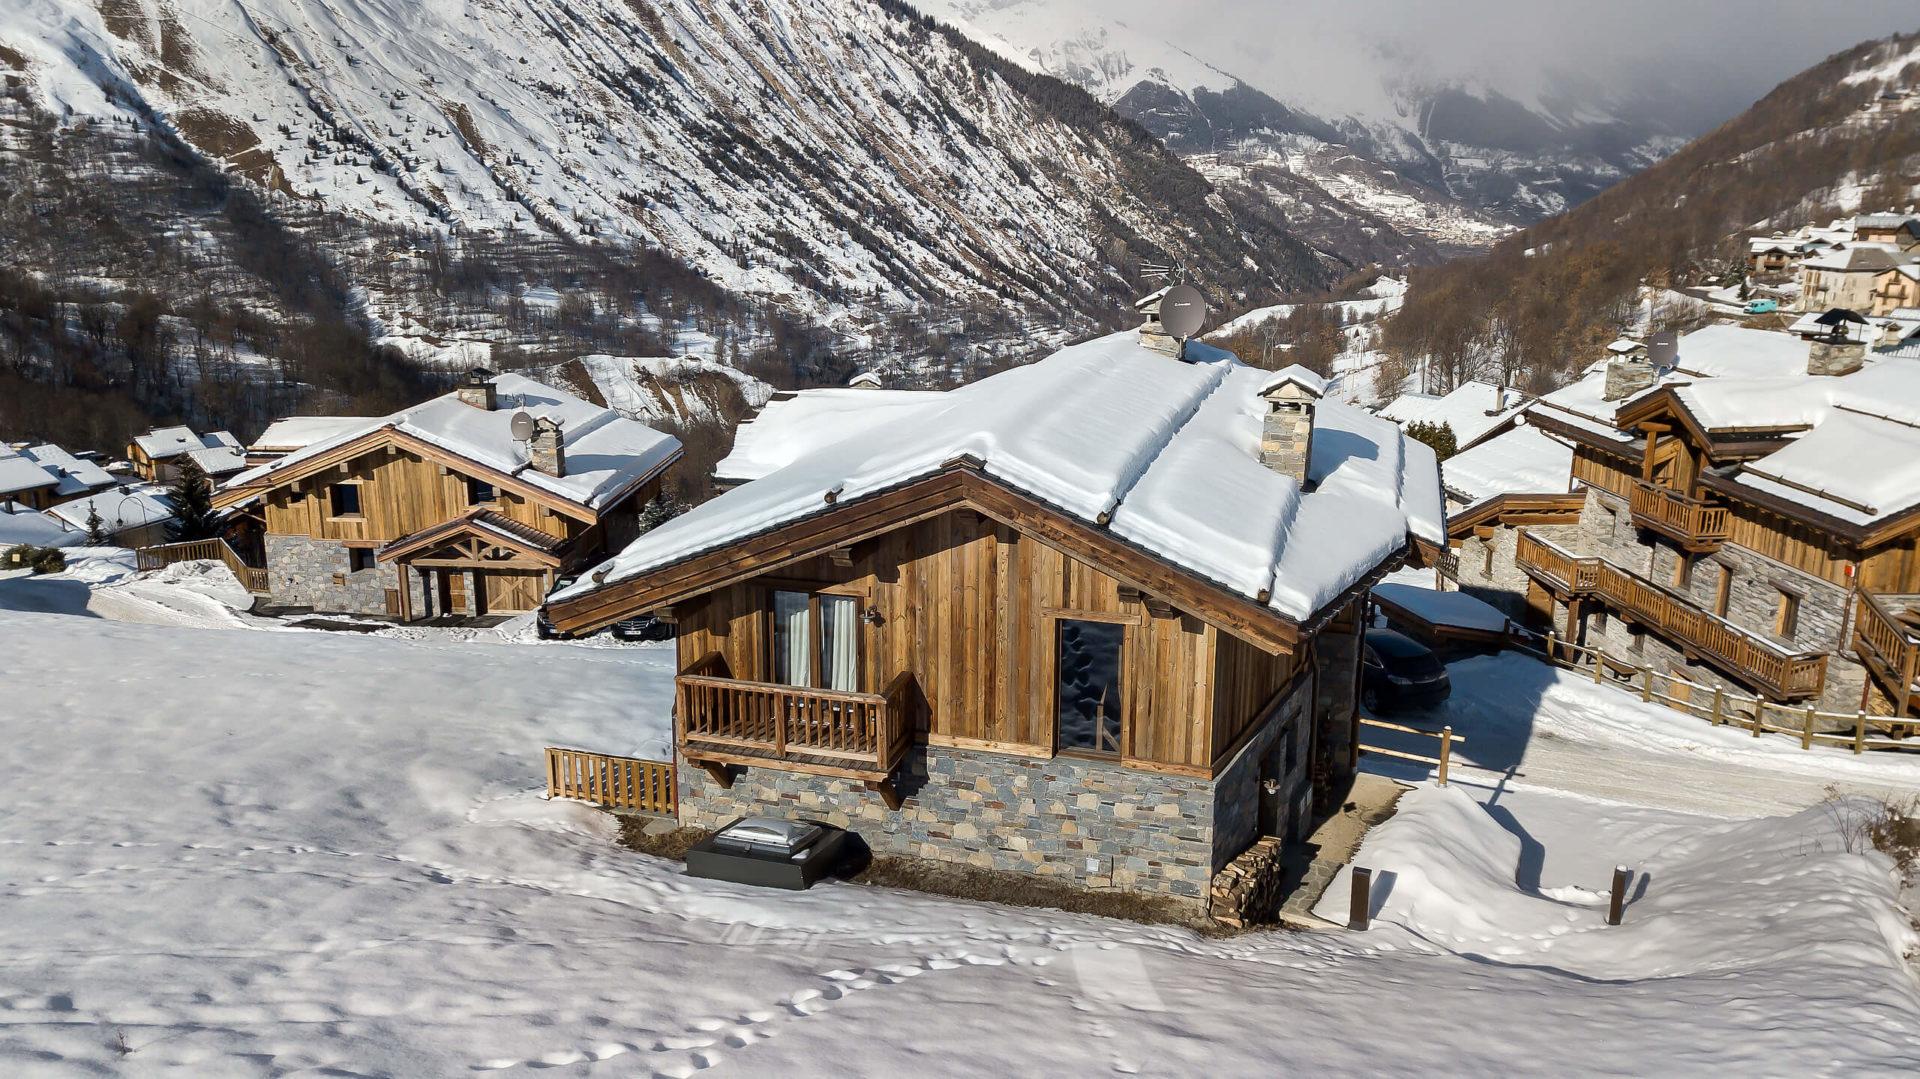 Chalet Mehrotra Perspective 6 - Saint Martin de Belleville, Savoie